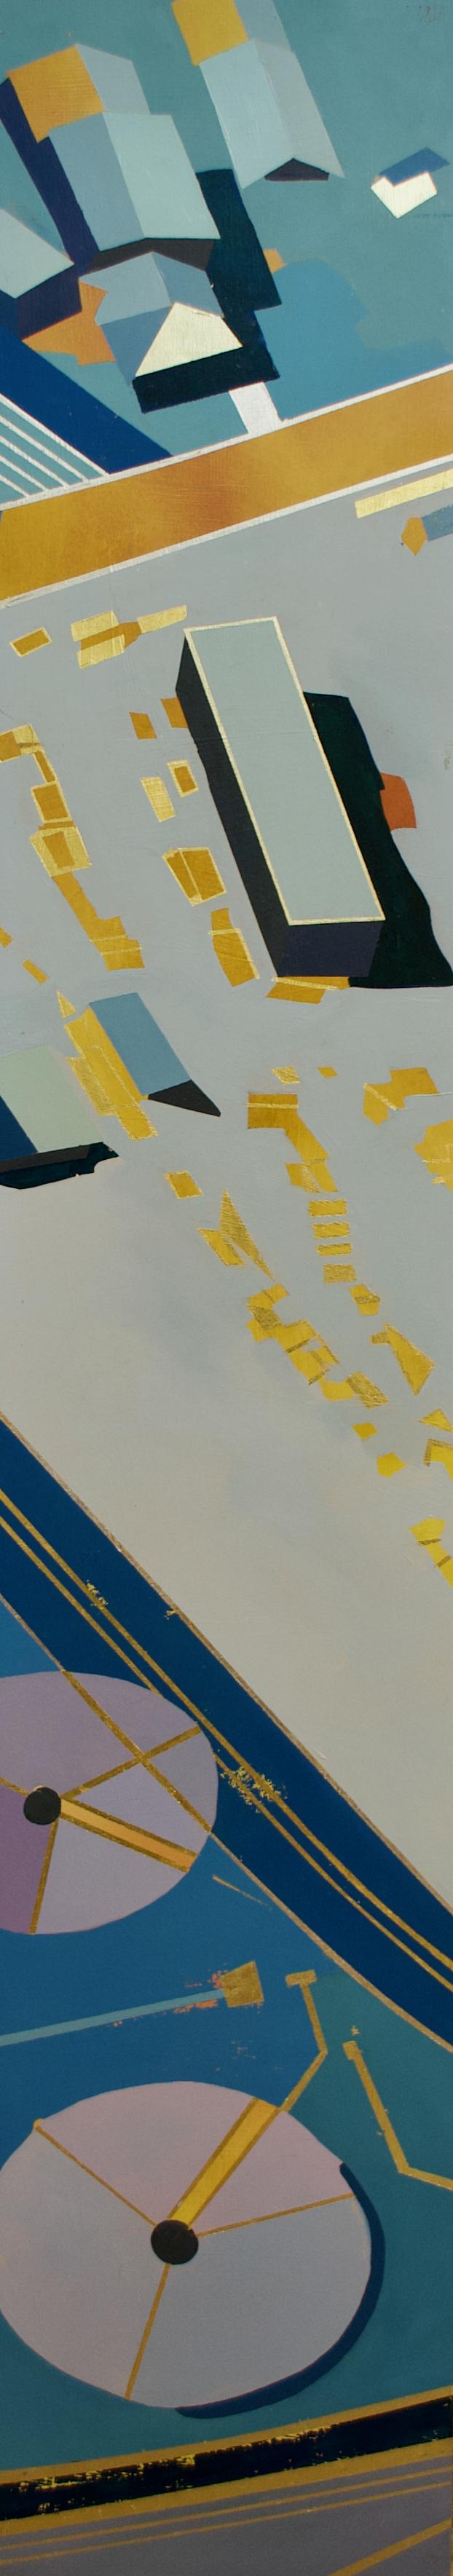 "Wonderwheel #2 - 55 "" x 10"" oil and gold leaf on panel$1700"